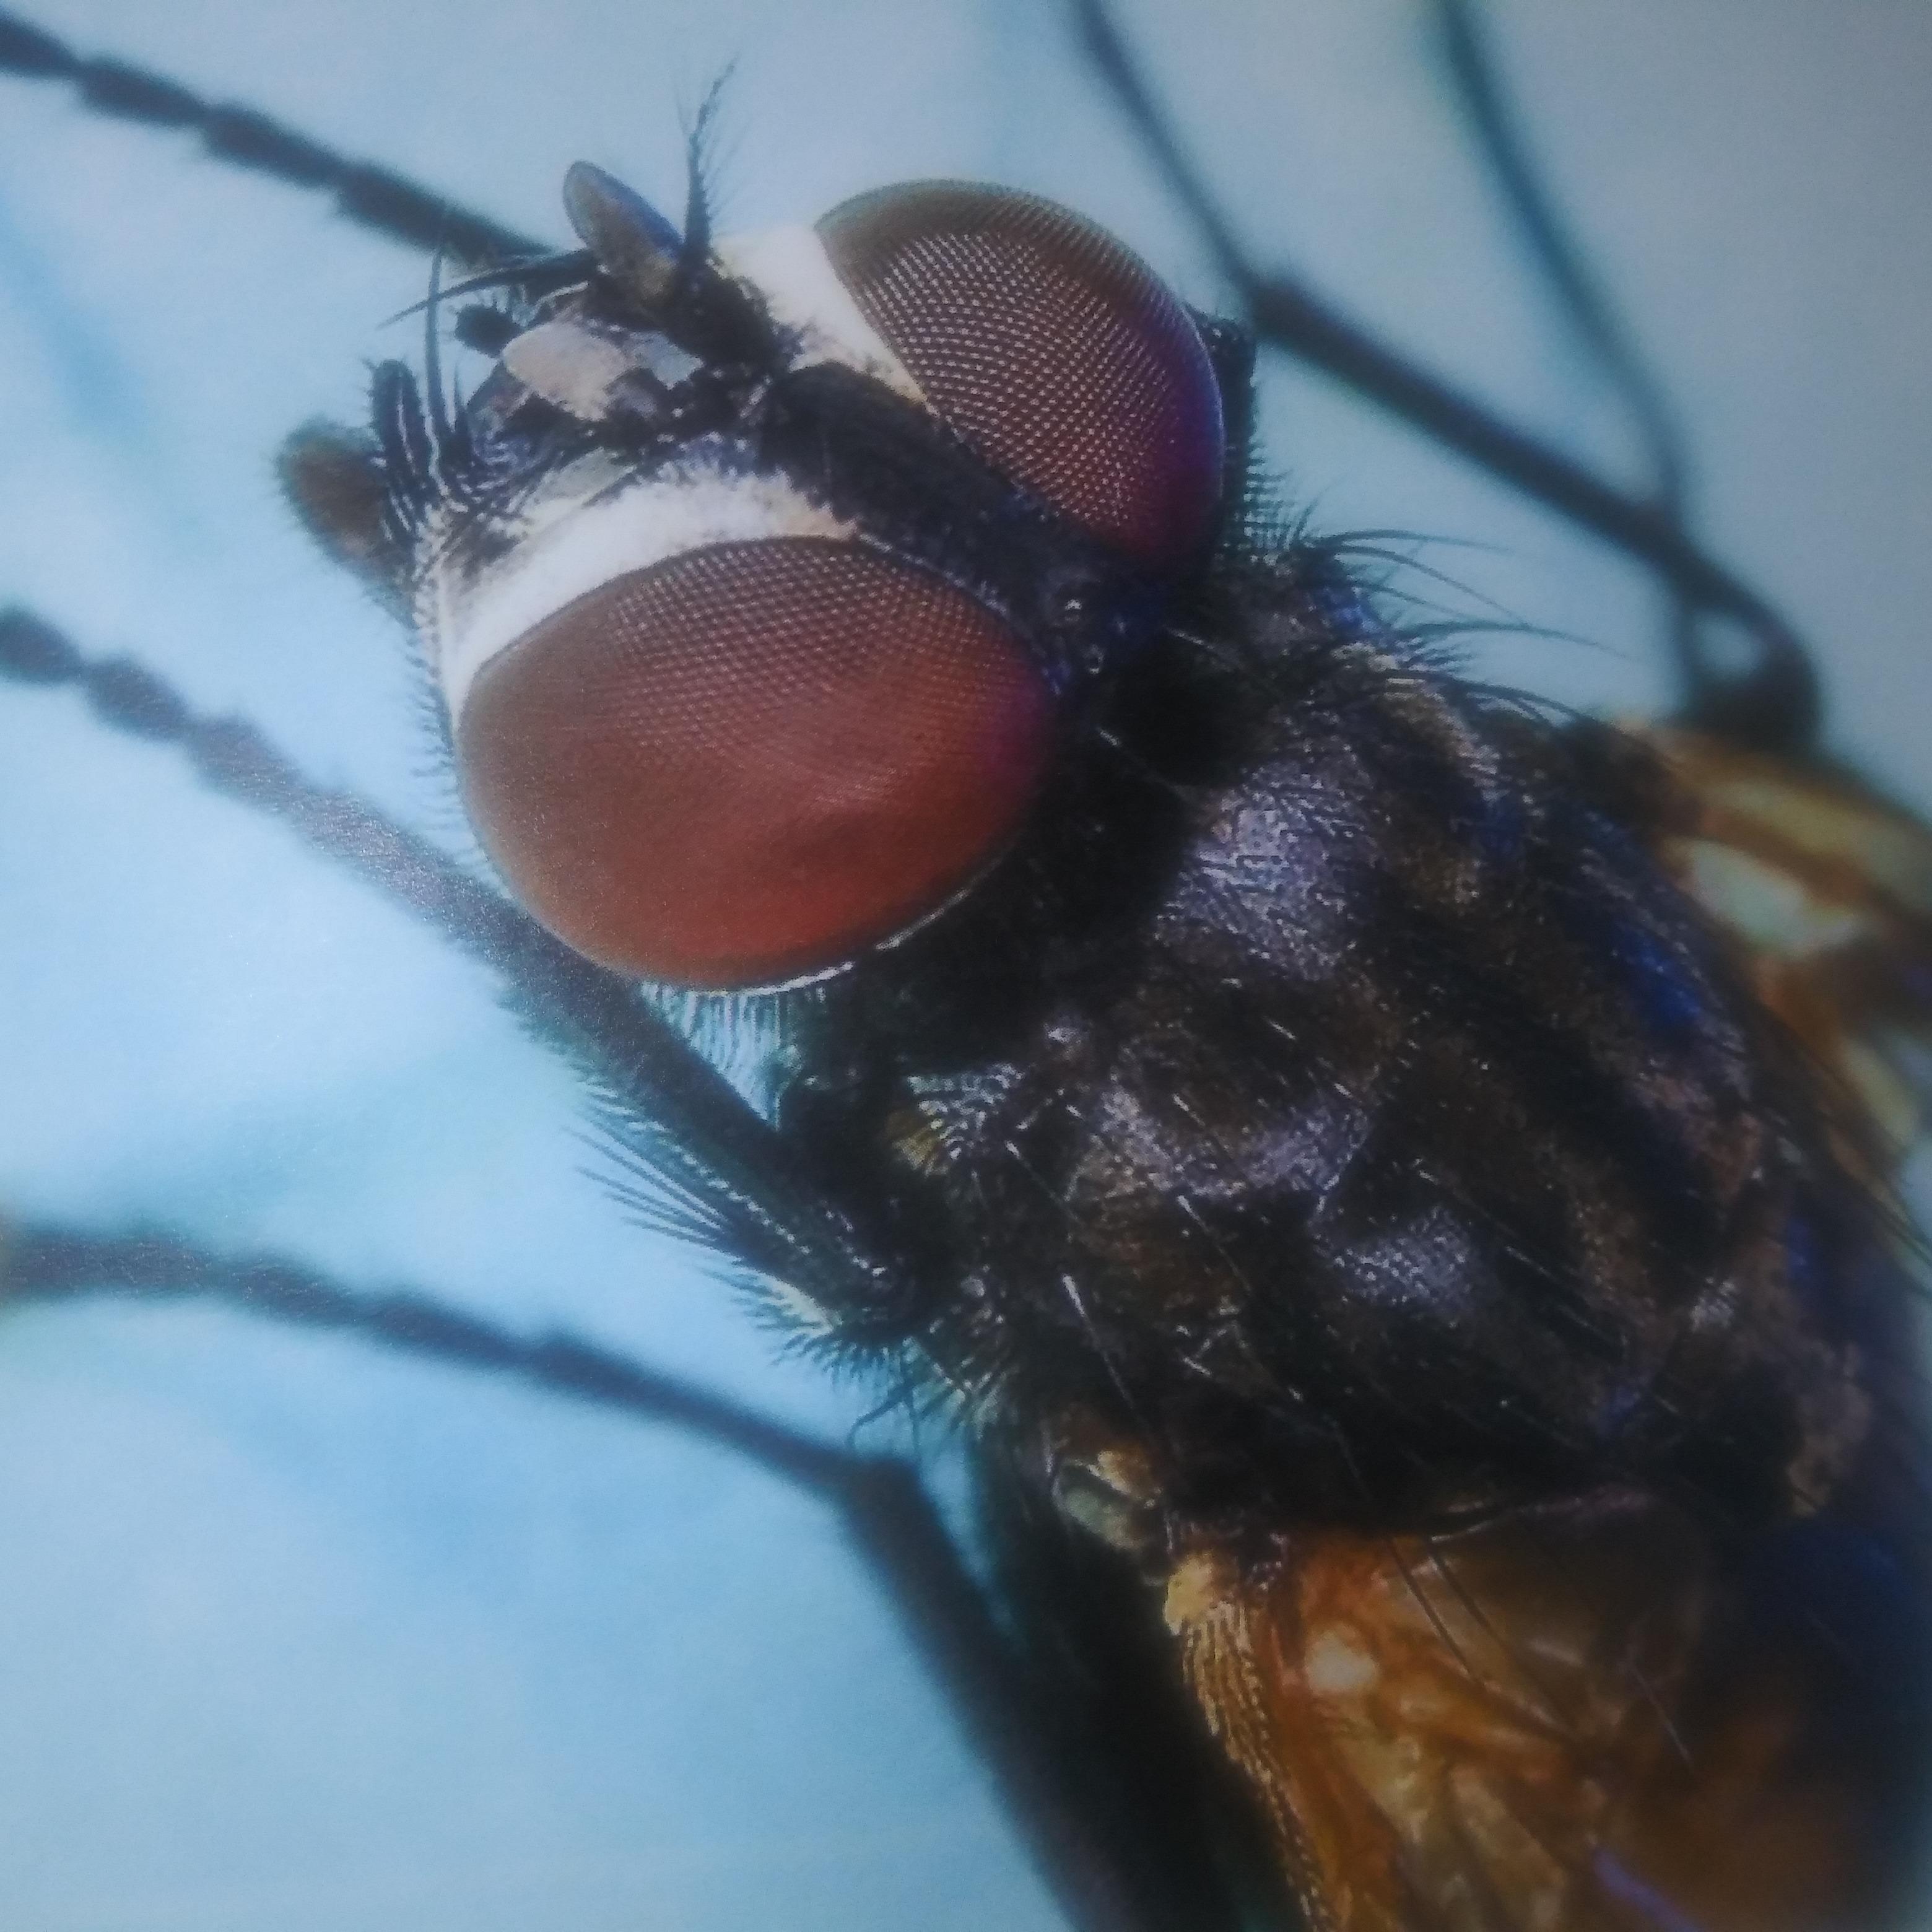 No Survivors Pest Control Company, Inc.